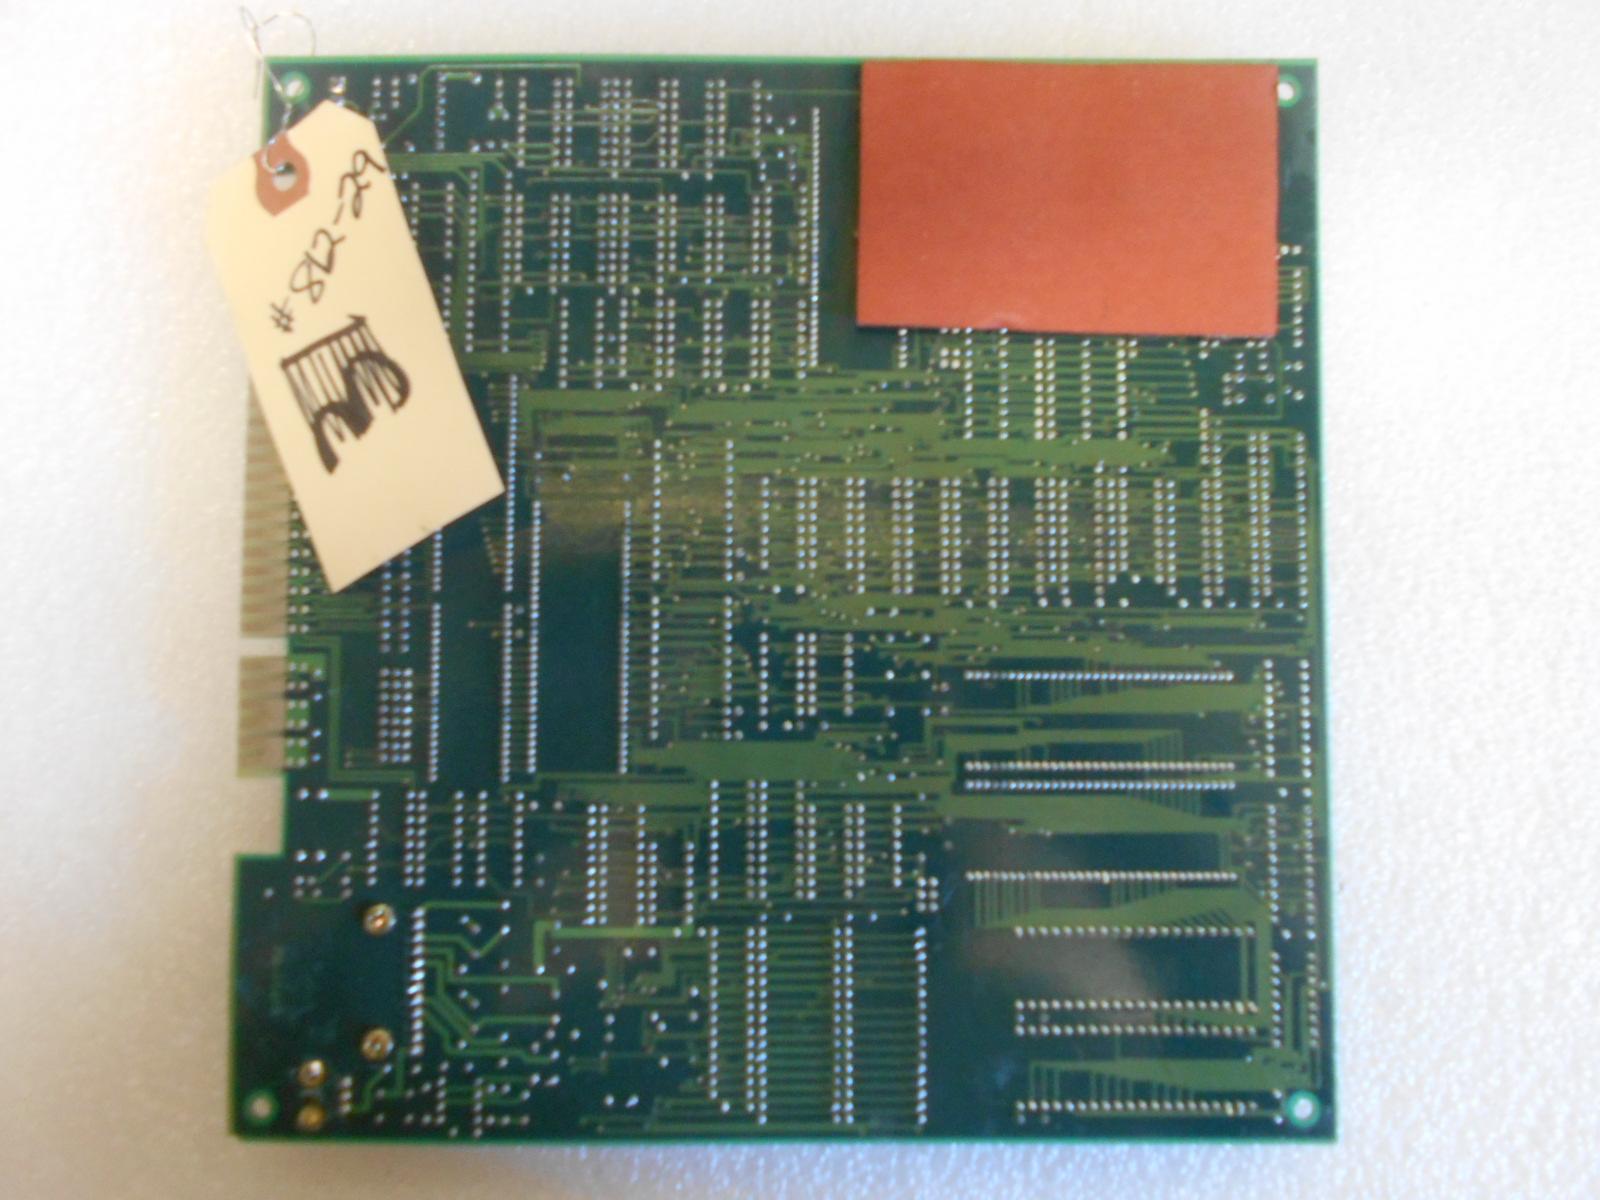 Crazy Bowl Arcade Machine Game PCB Printed Circuit Board